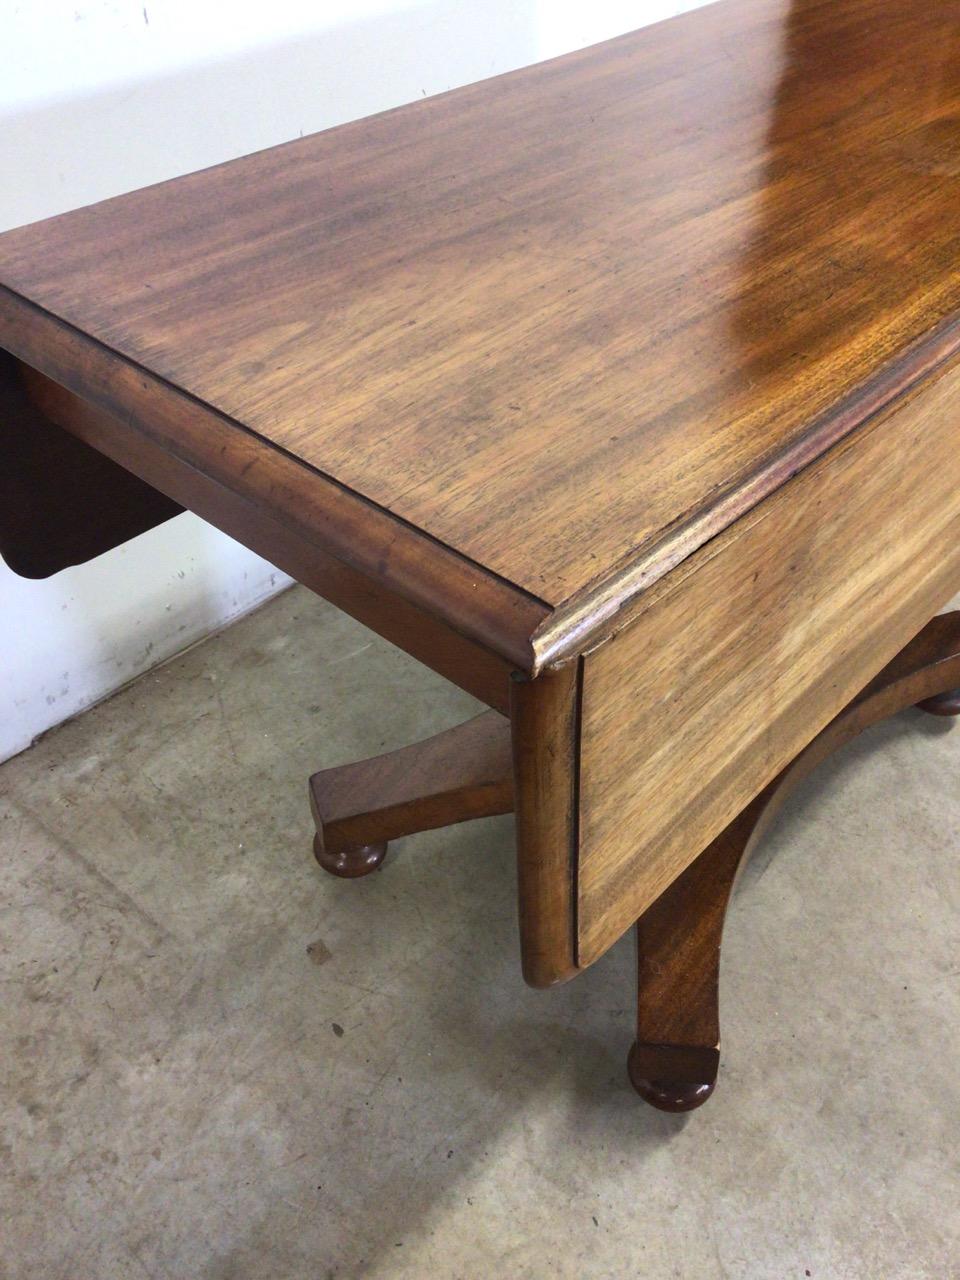 A Victorian Pembroke table with drop leaf sides, pedestal base with turned feet on metal castors. - Image 4 of 6